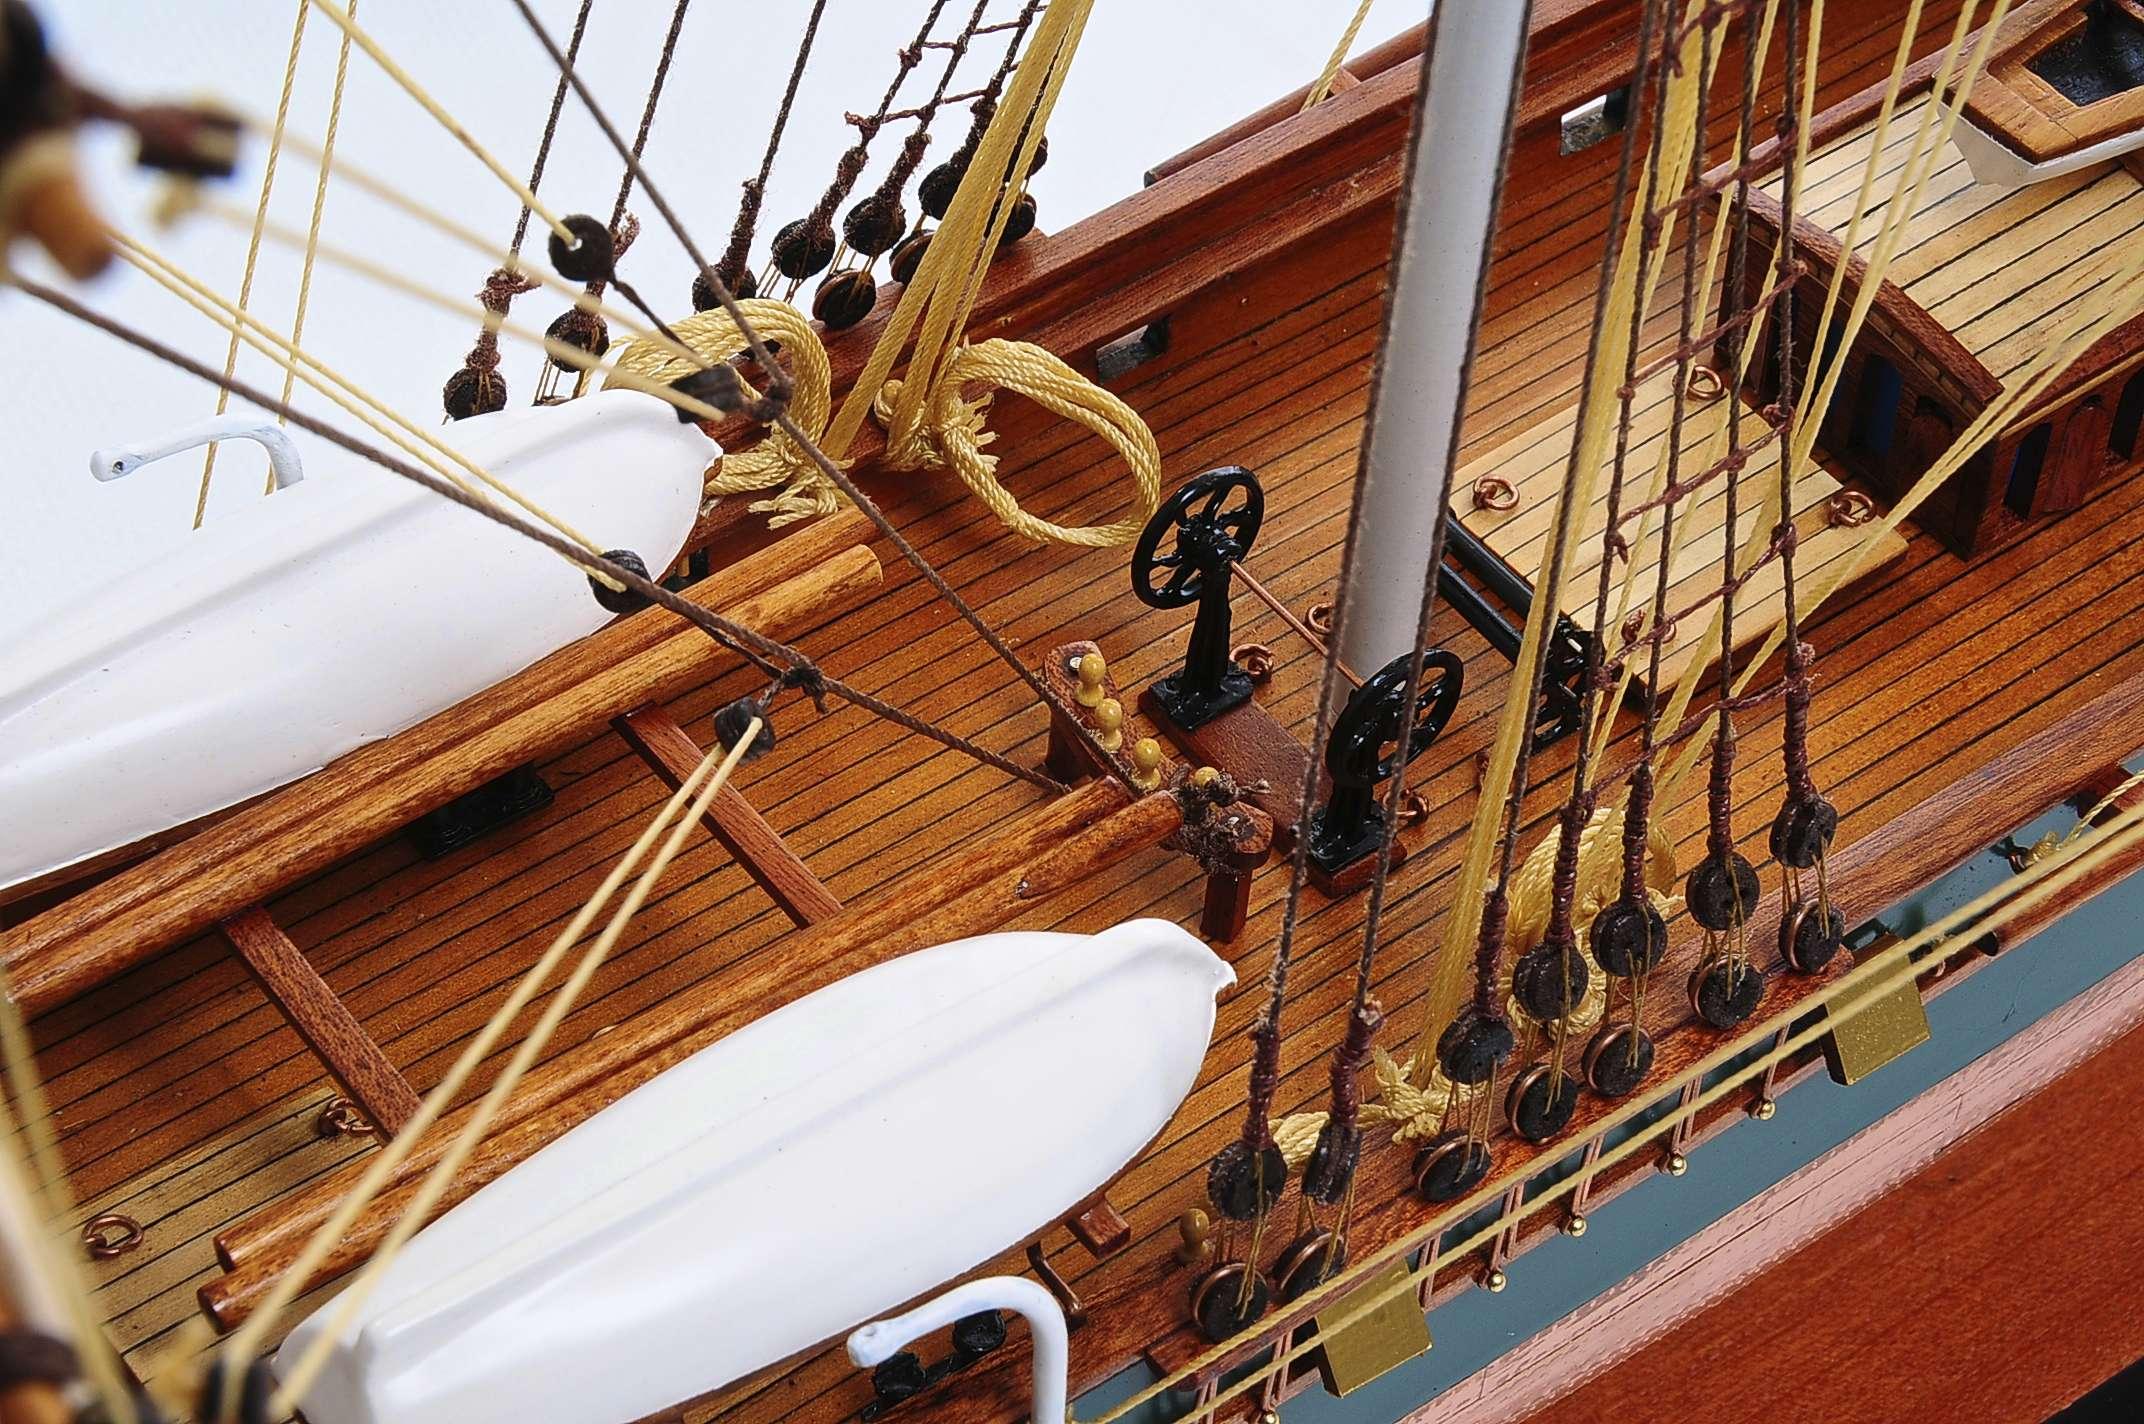 1434-4865-Thermopylae-Model-Boat